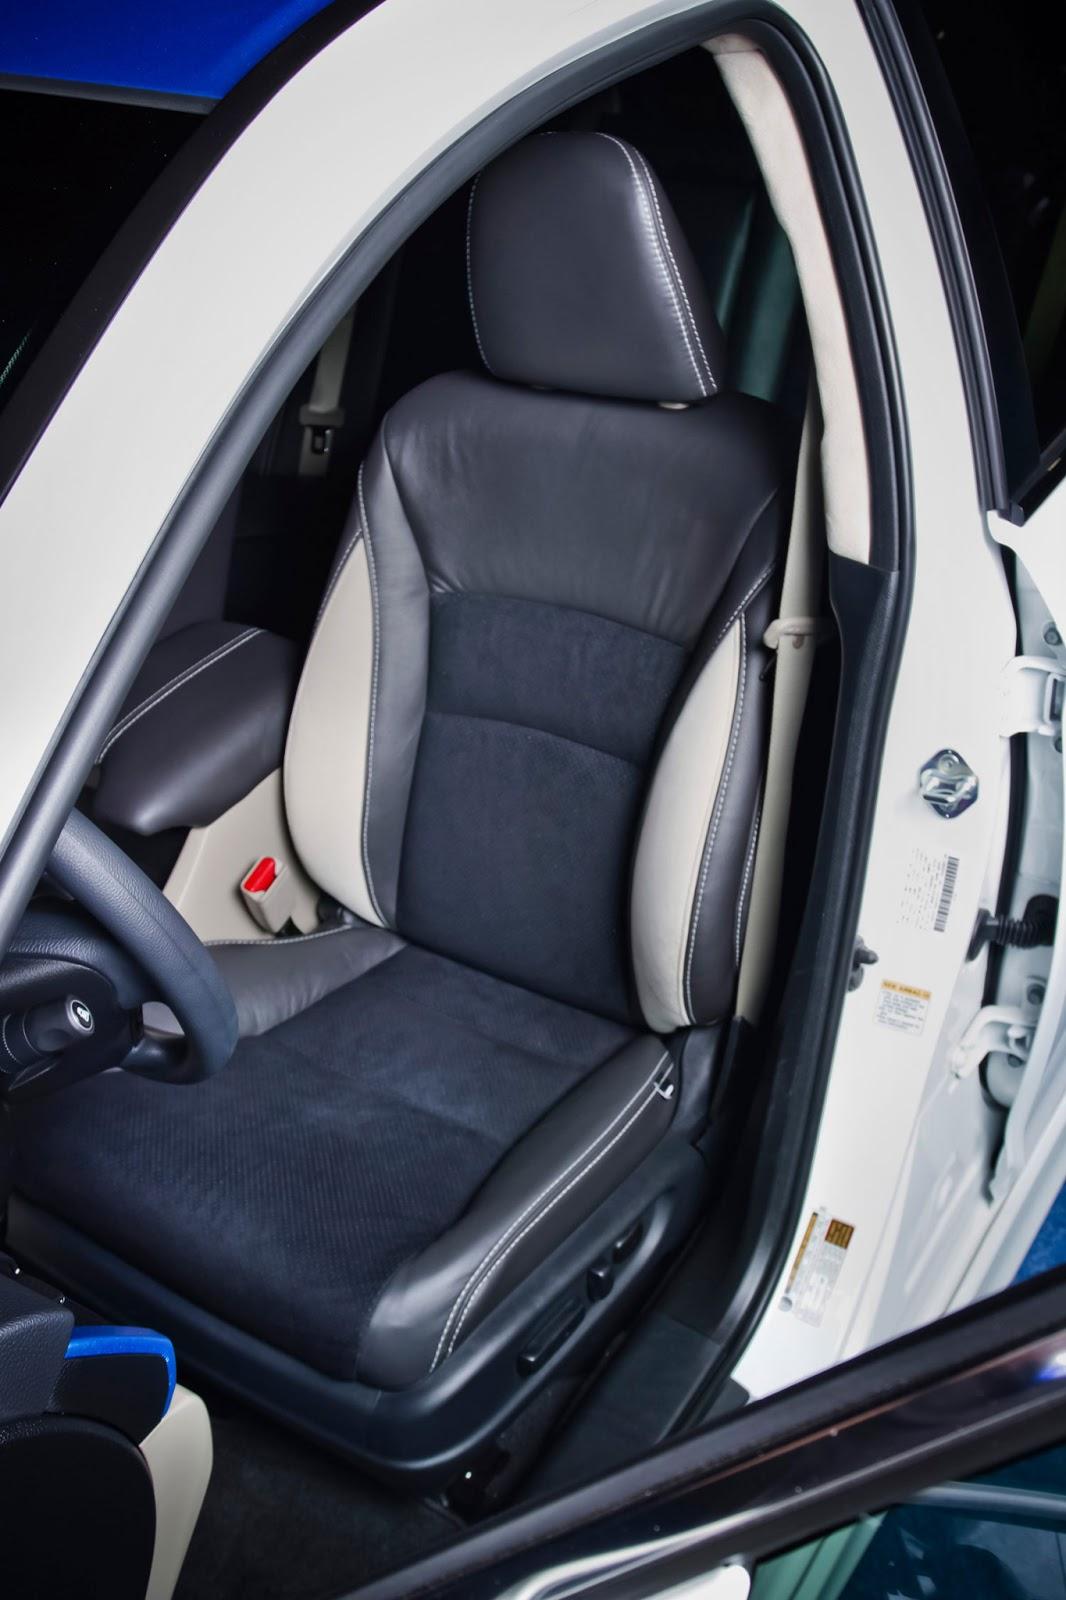 Honda Accord Sedan Black With Charcoal Leather further Honda Accord Sedan Se S Oem also D Rare Accord V Ex L Manual Coupe besides Honda Pilot Ex Awd Pic X furthermore Bb Da B. on 2012 honda accord ex